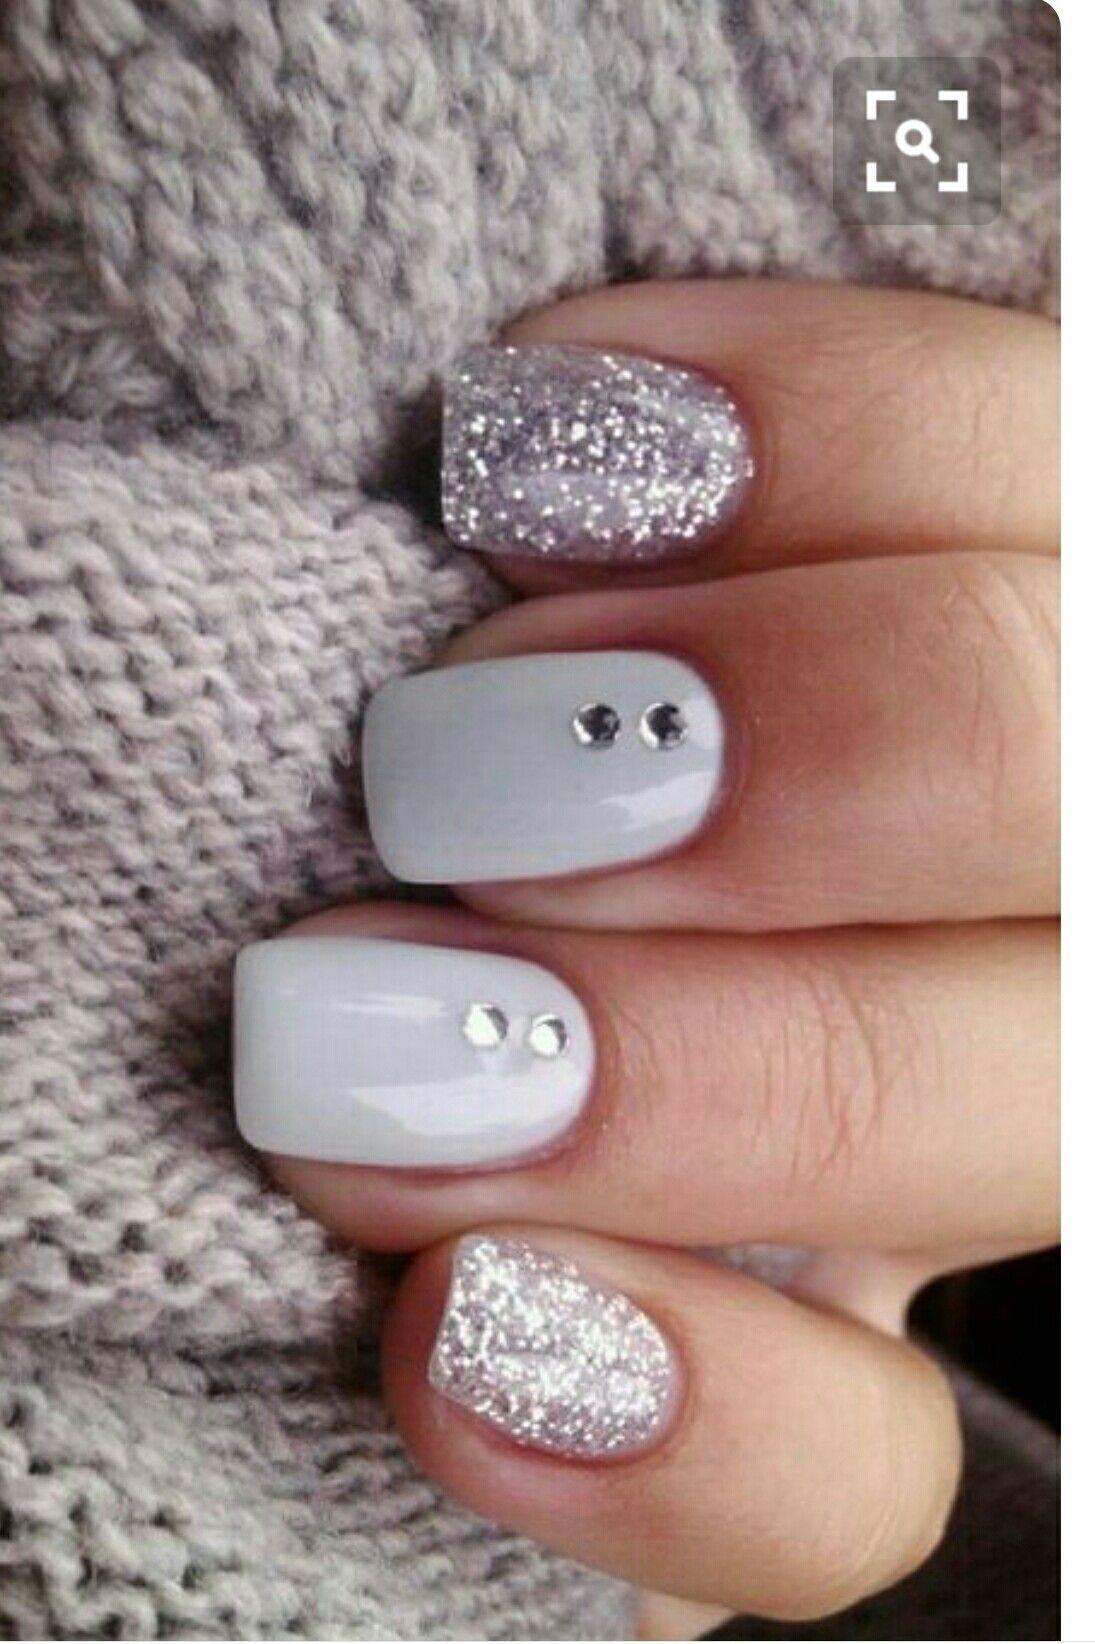 Pin by Nicole Fults on Nail Ideas | Pinterest | Short nails, Nail ...